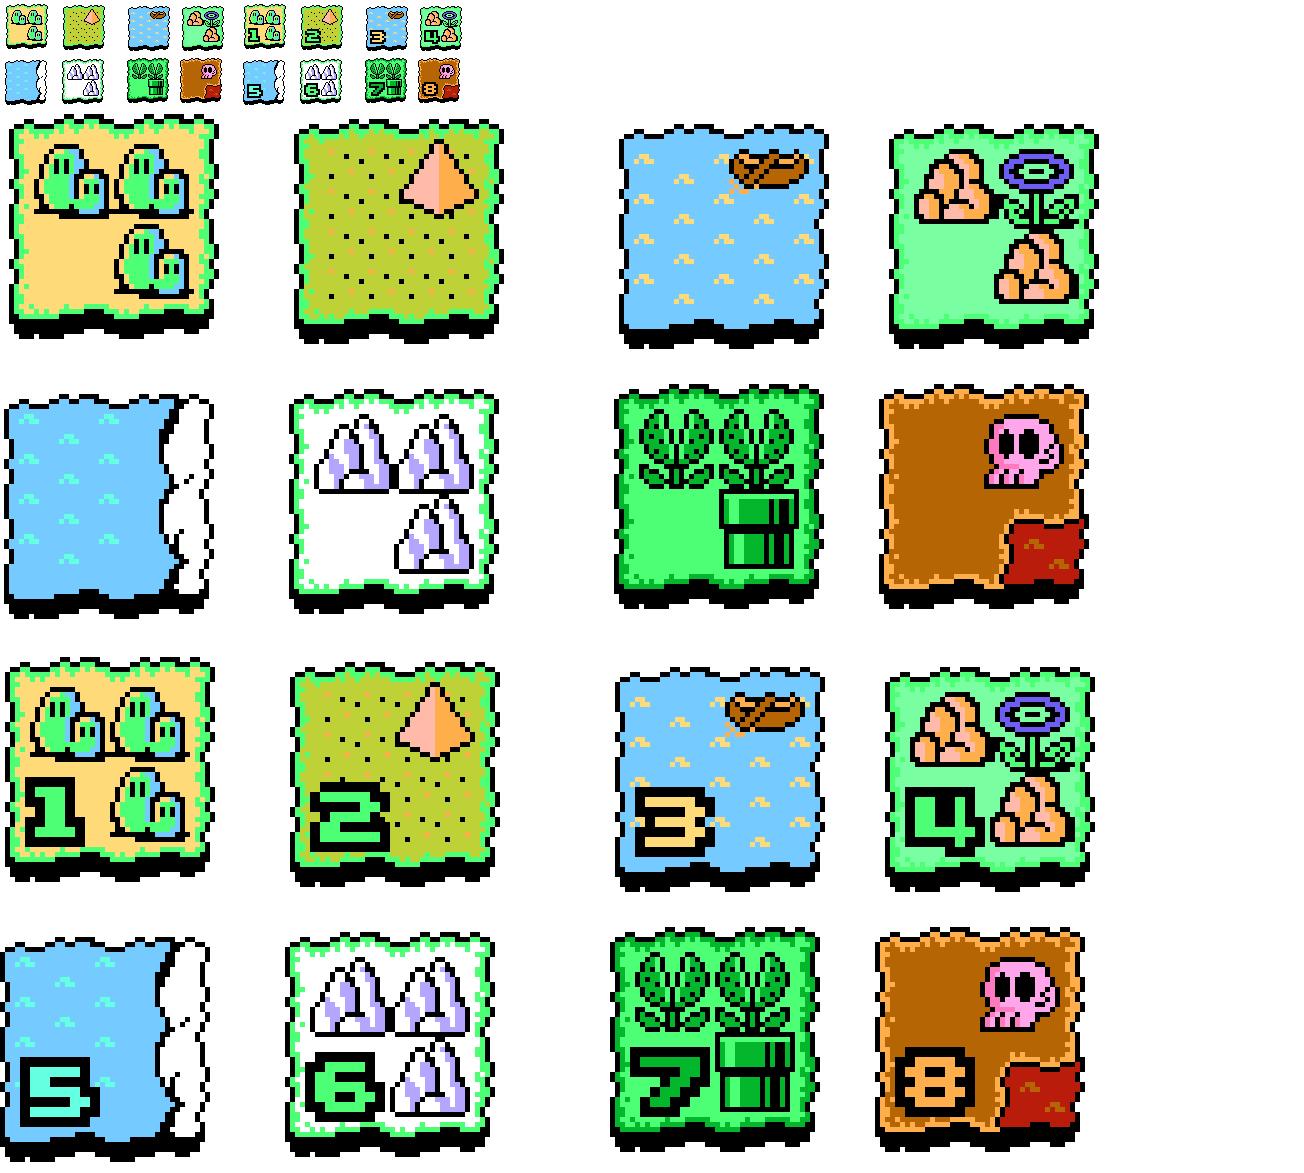 Super Mario Bros 3 Map Icons By Dinodilopho On Deviantart